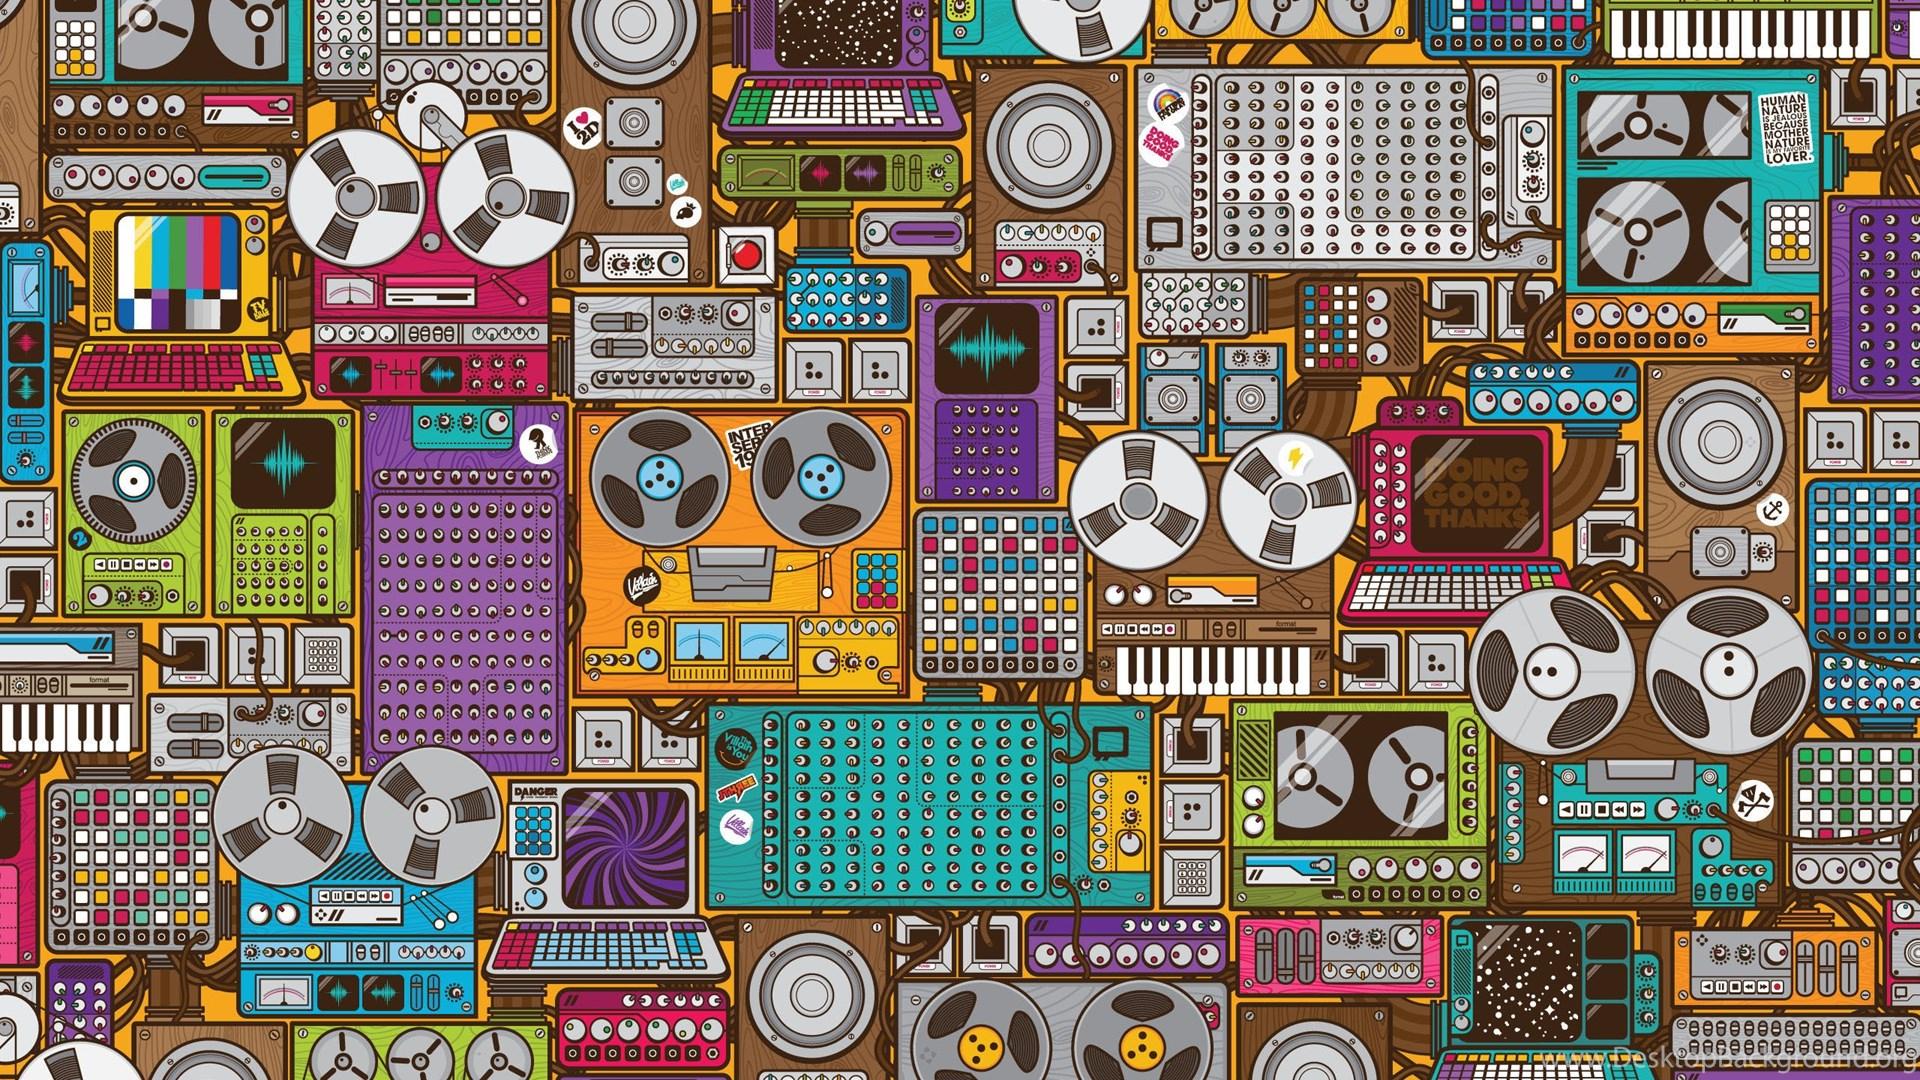 Top Wallpaper Music Mac - 691107_story-of-recorded-music-apple-mac-desktop-wallpapers-hd-majak-mac_2560x1600_h  You Should Have_74421.jpg